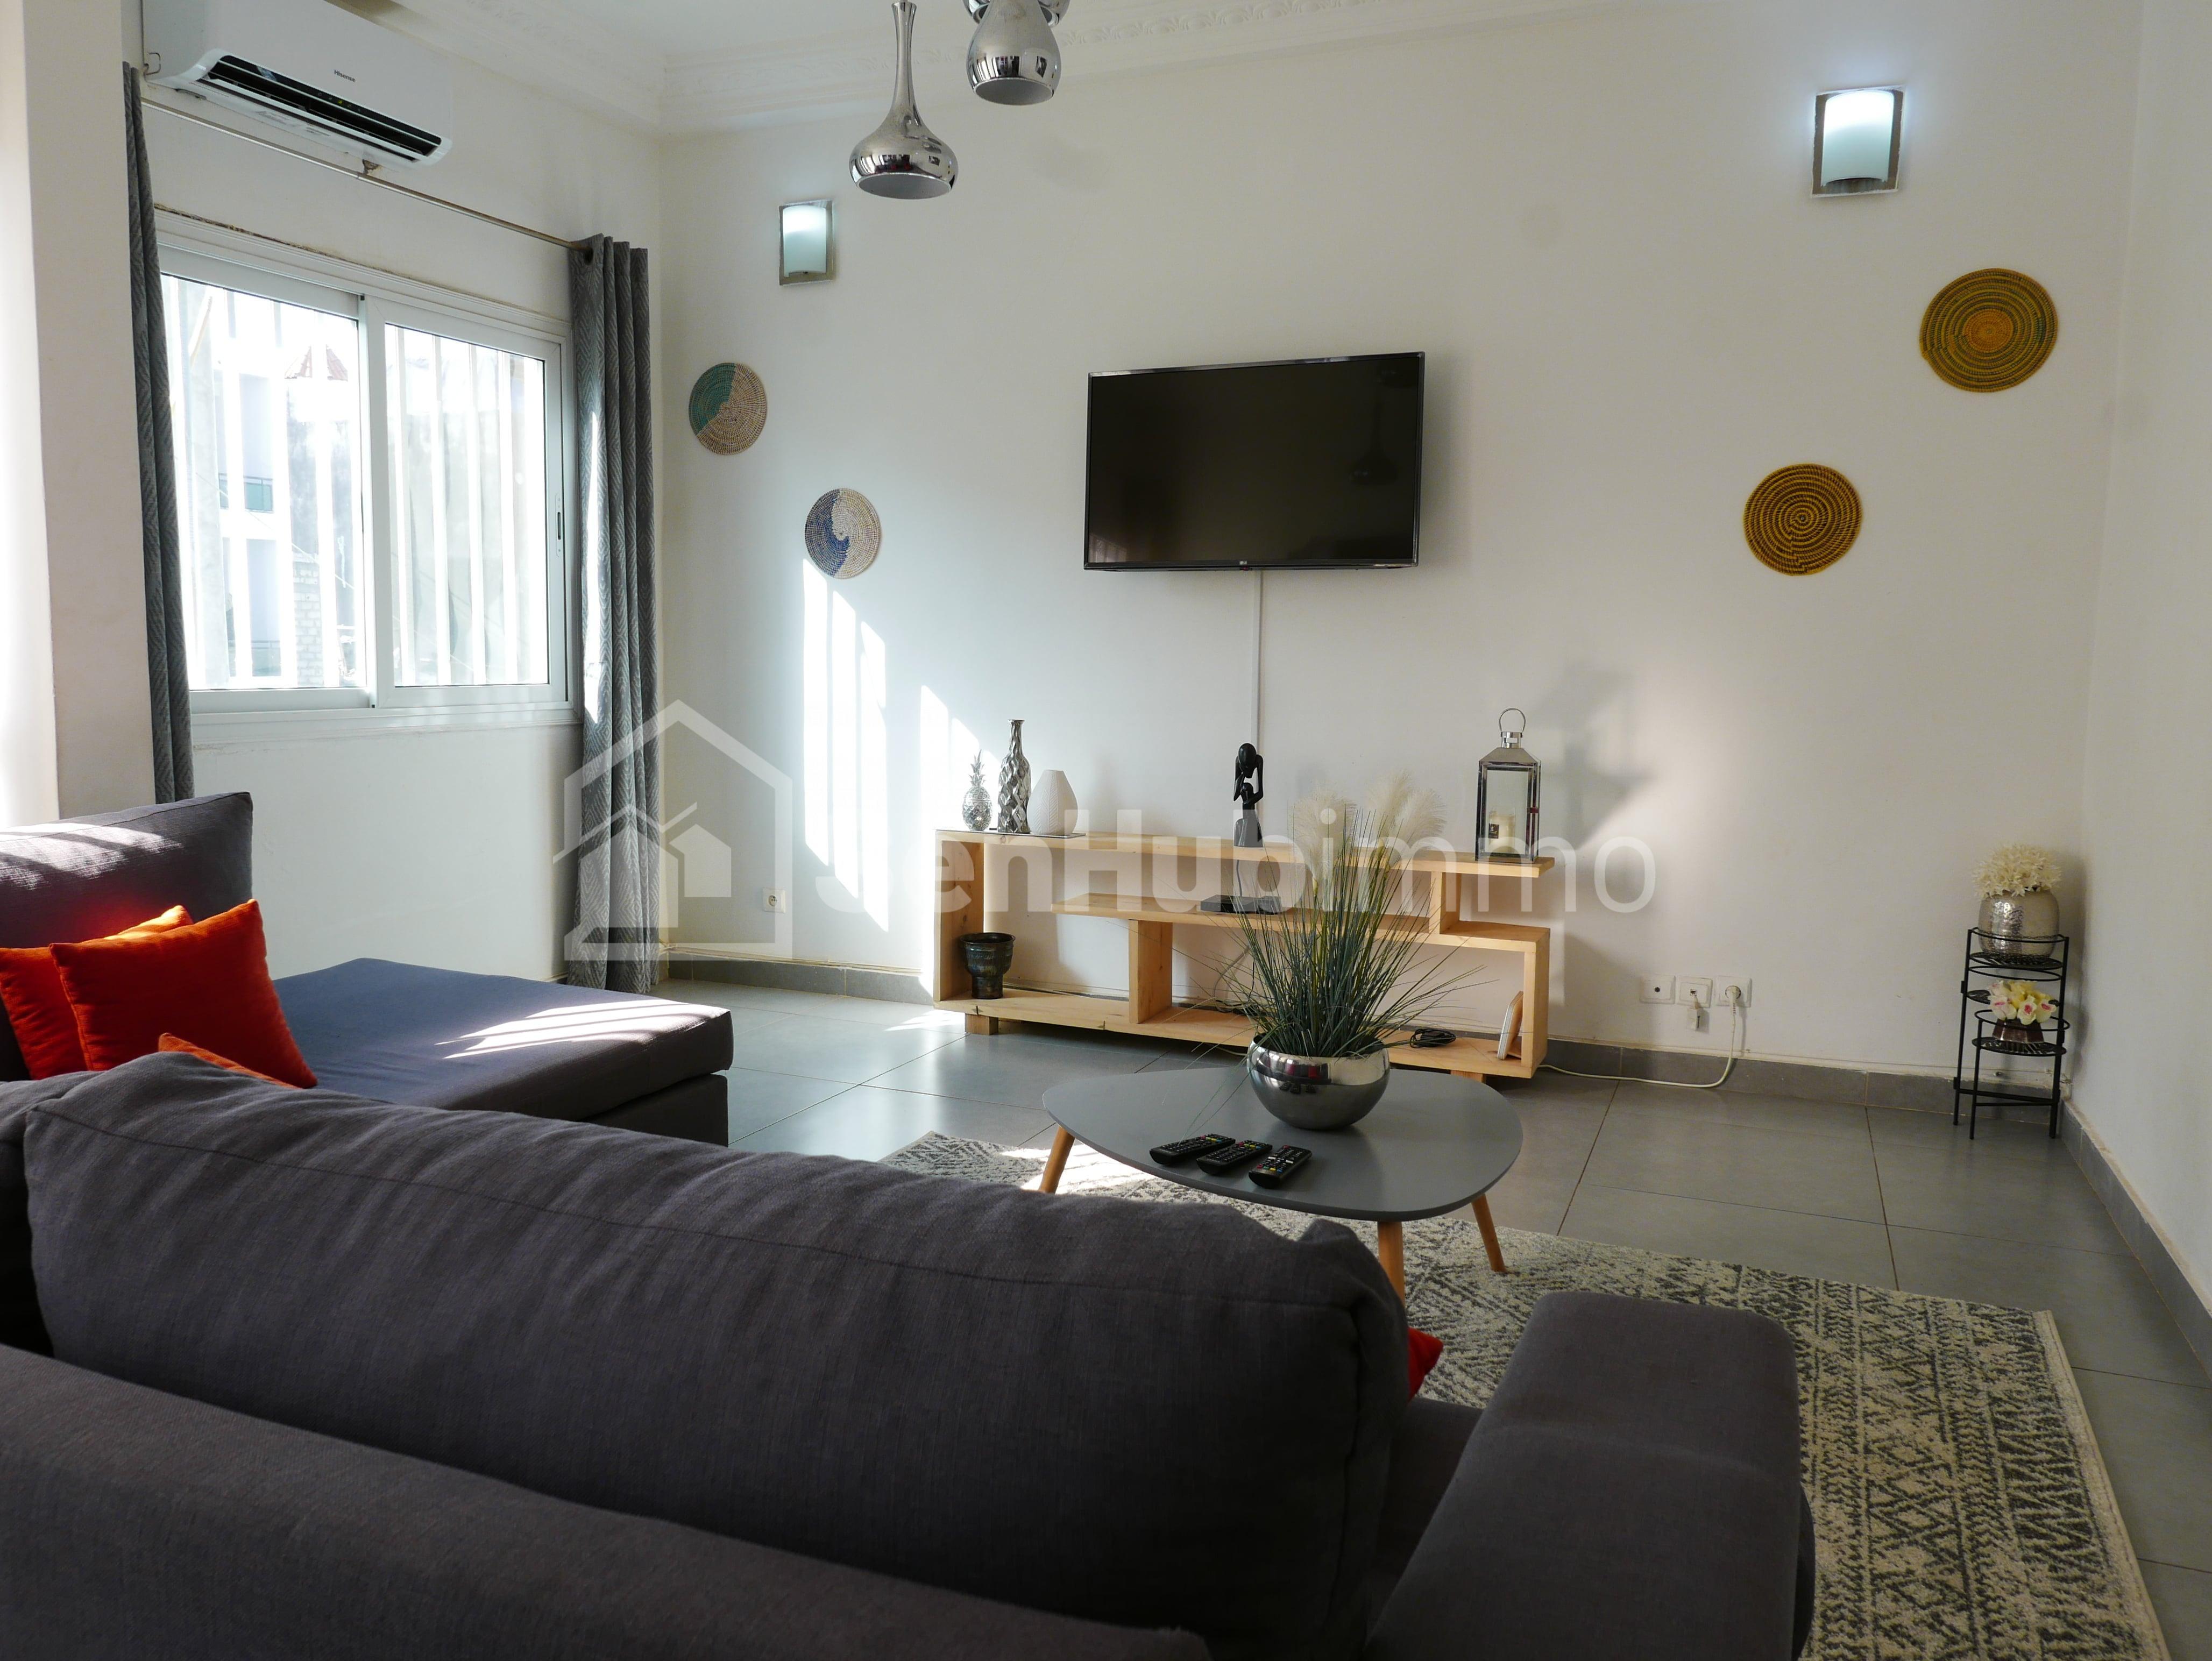 Appartement 3 chambres salon, Ngor Almadies - SenhubImmo.com